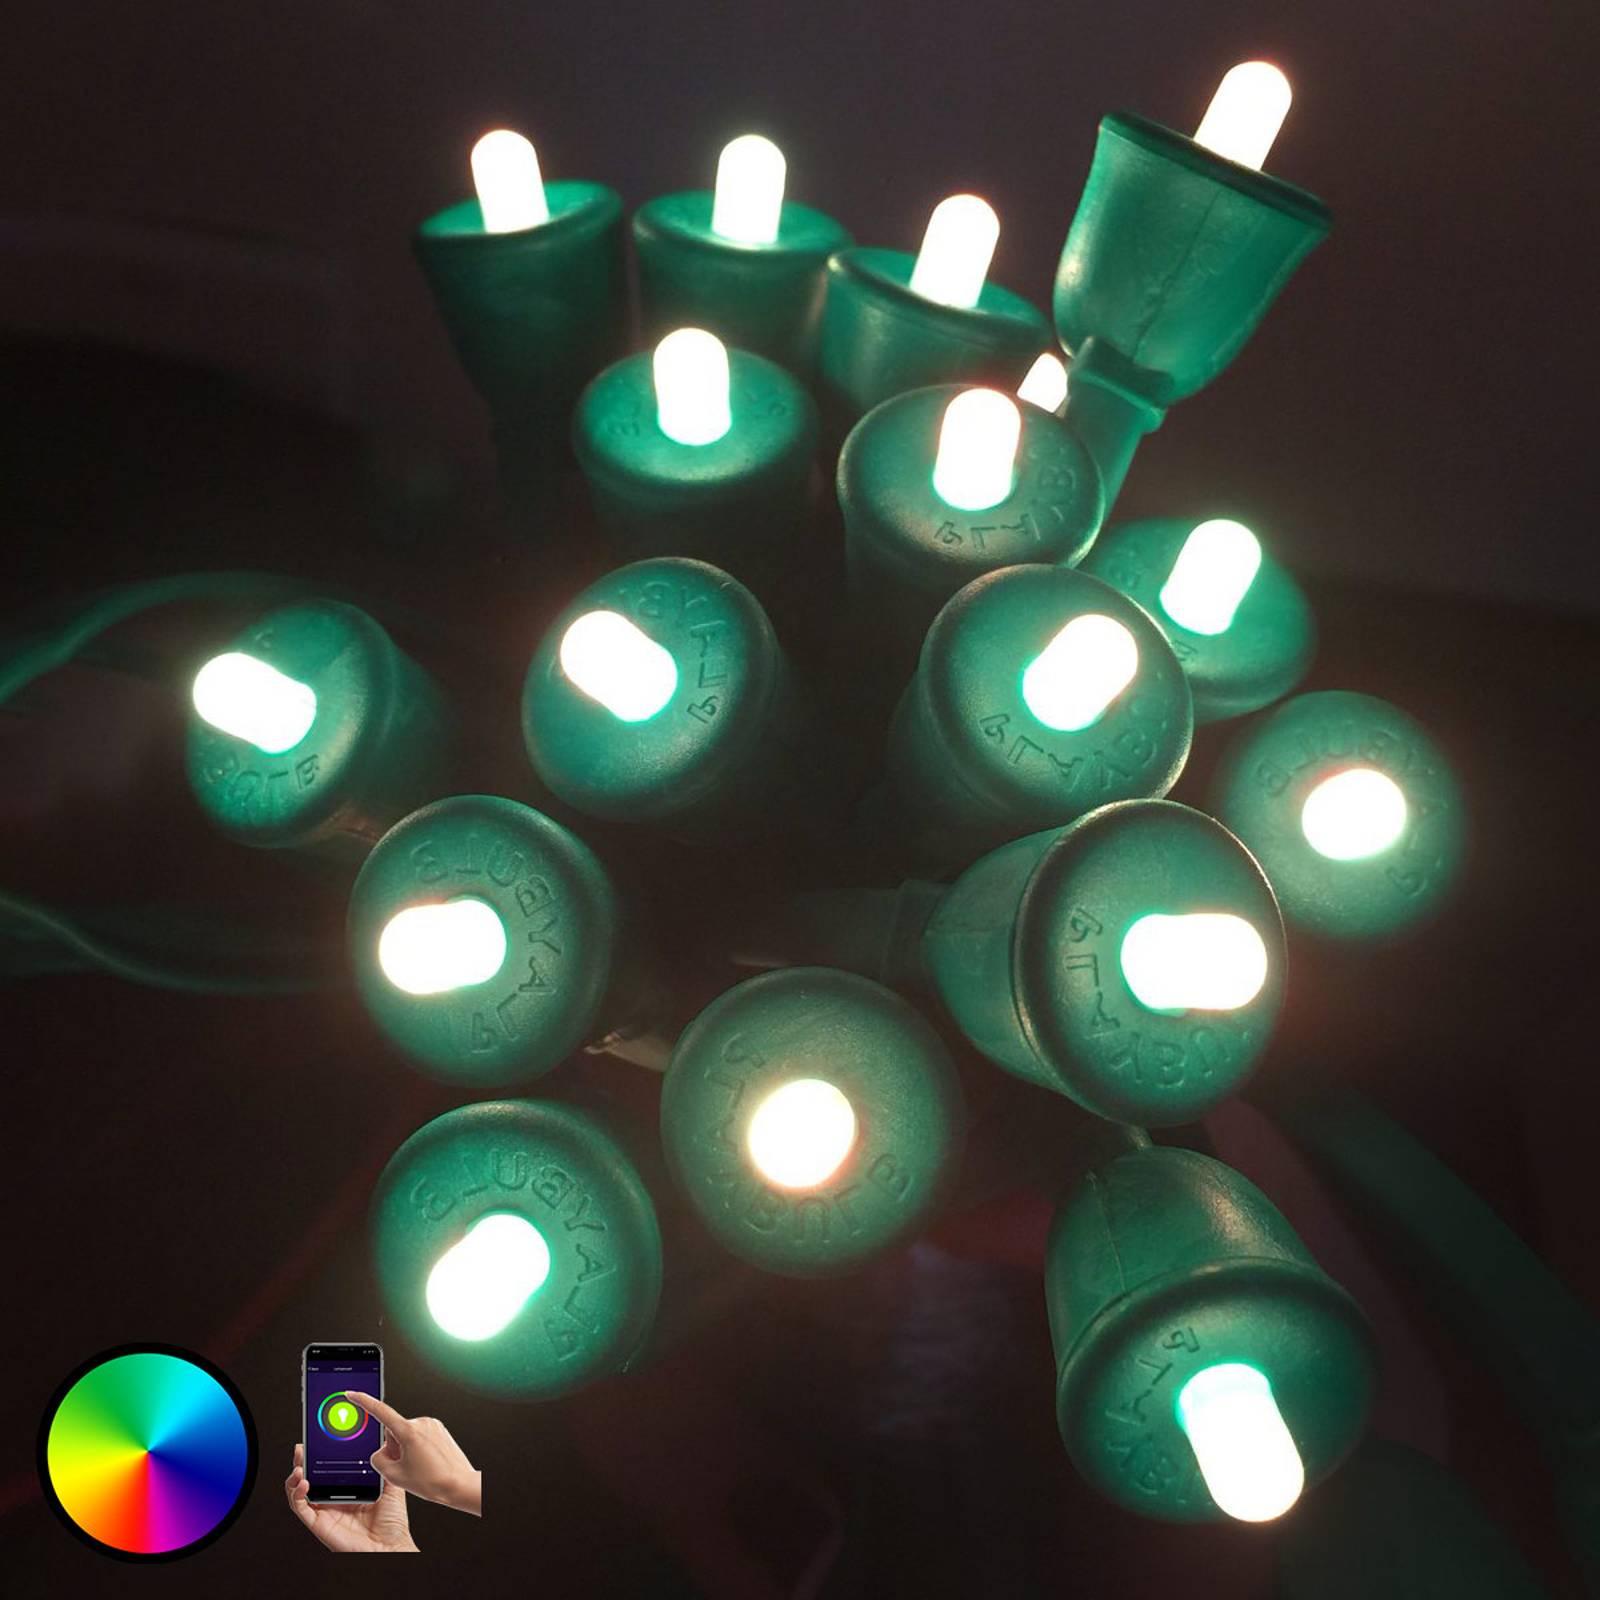 MiPow Playbulb String catena LED 15 m, verde